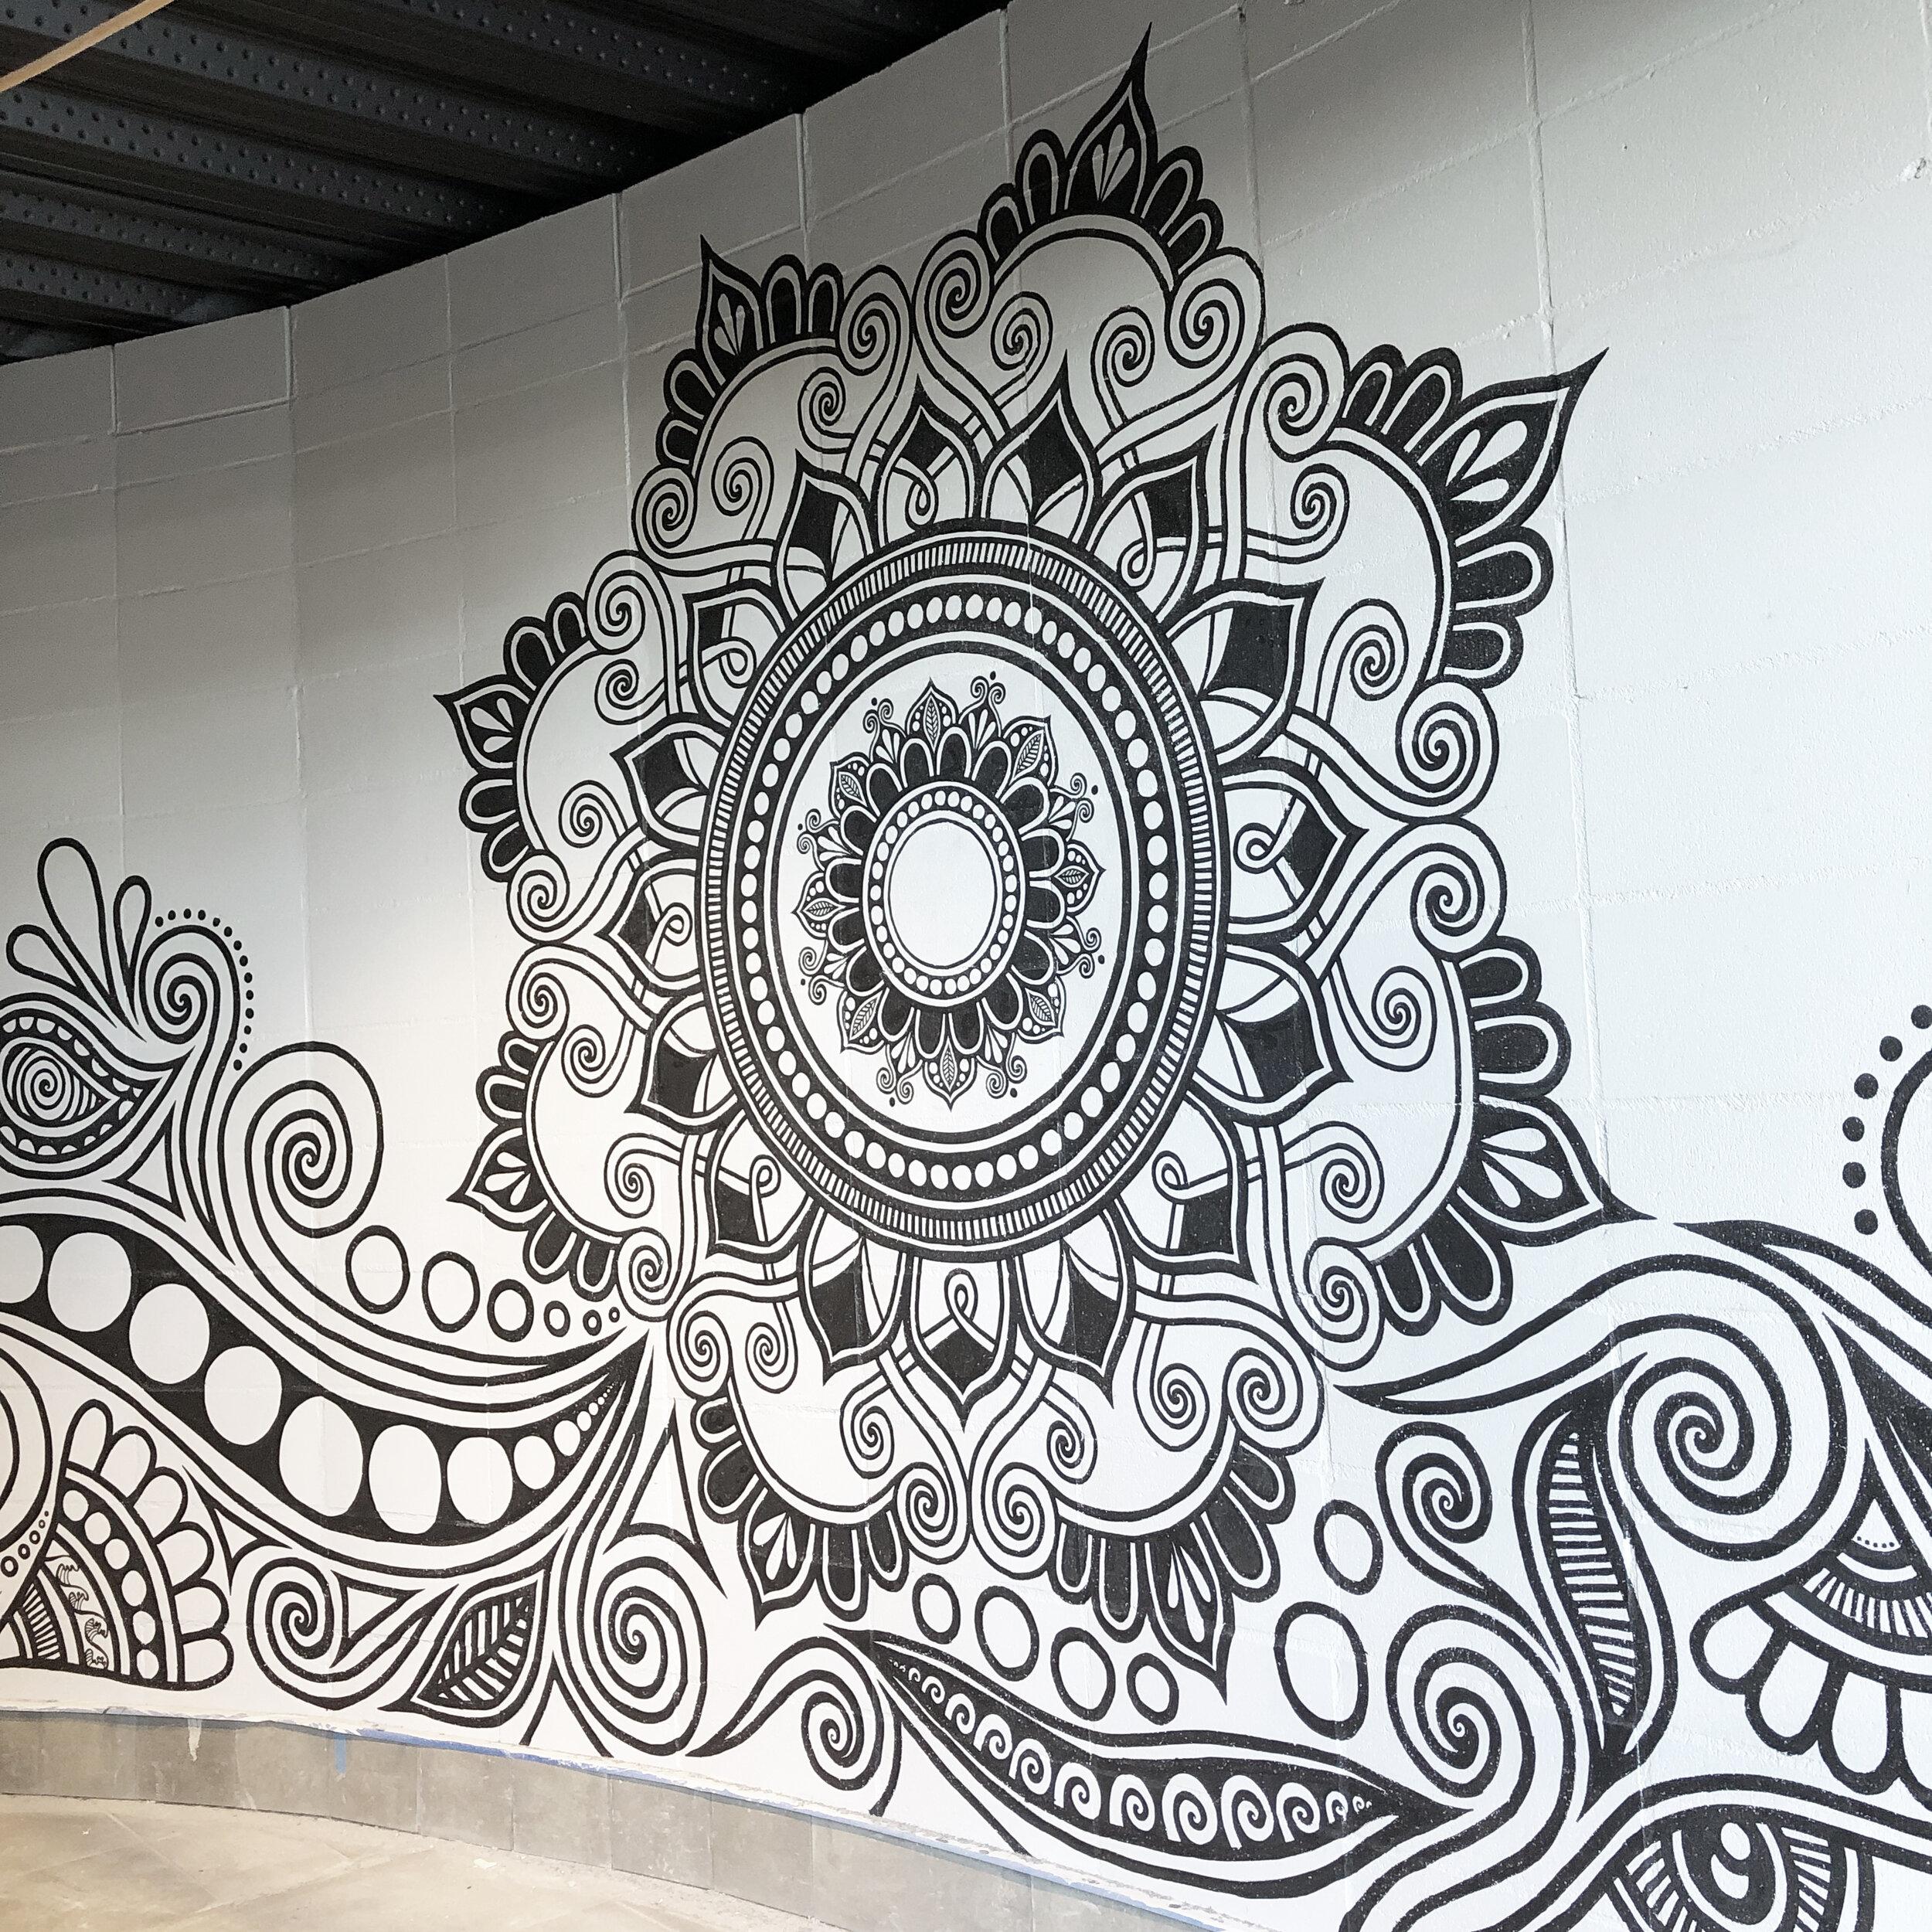 fortyonehundred-wall-mural-artist5.jpg